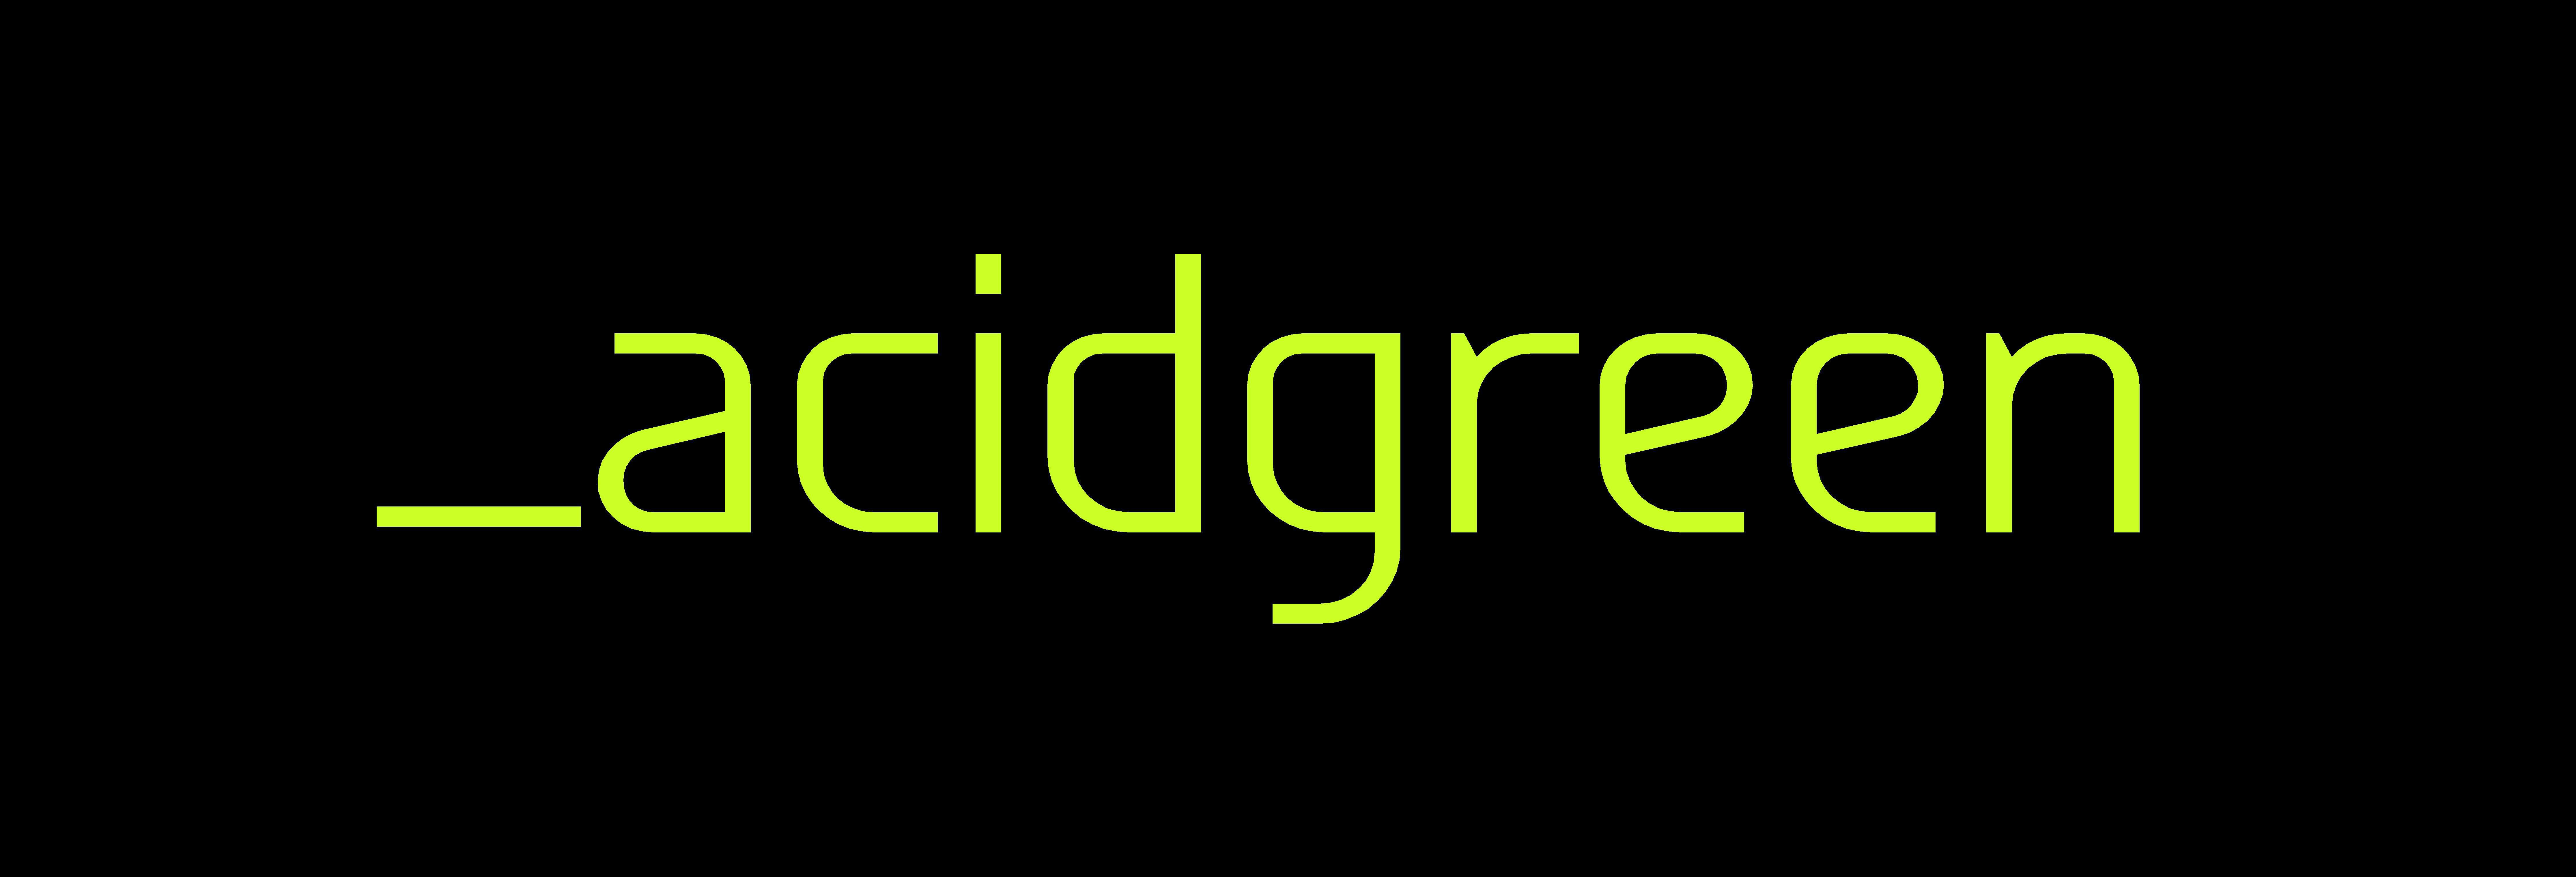 acidgreen - logo